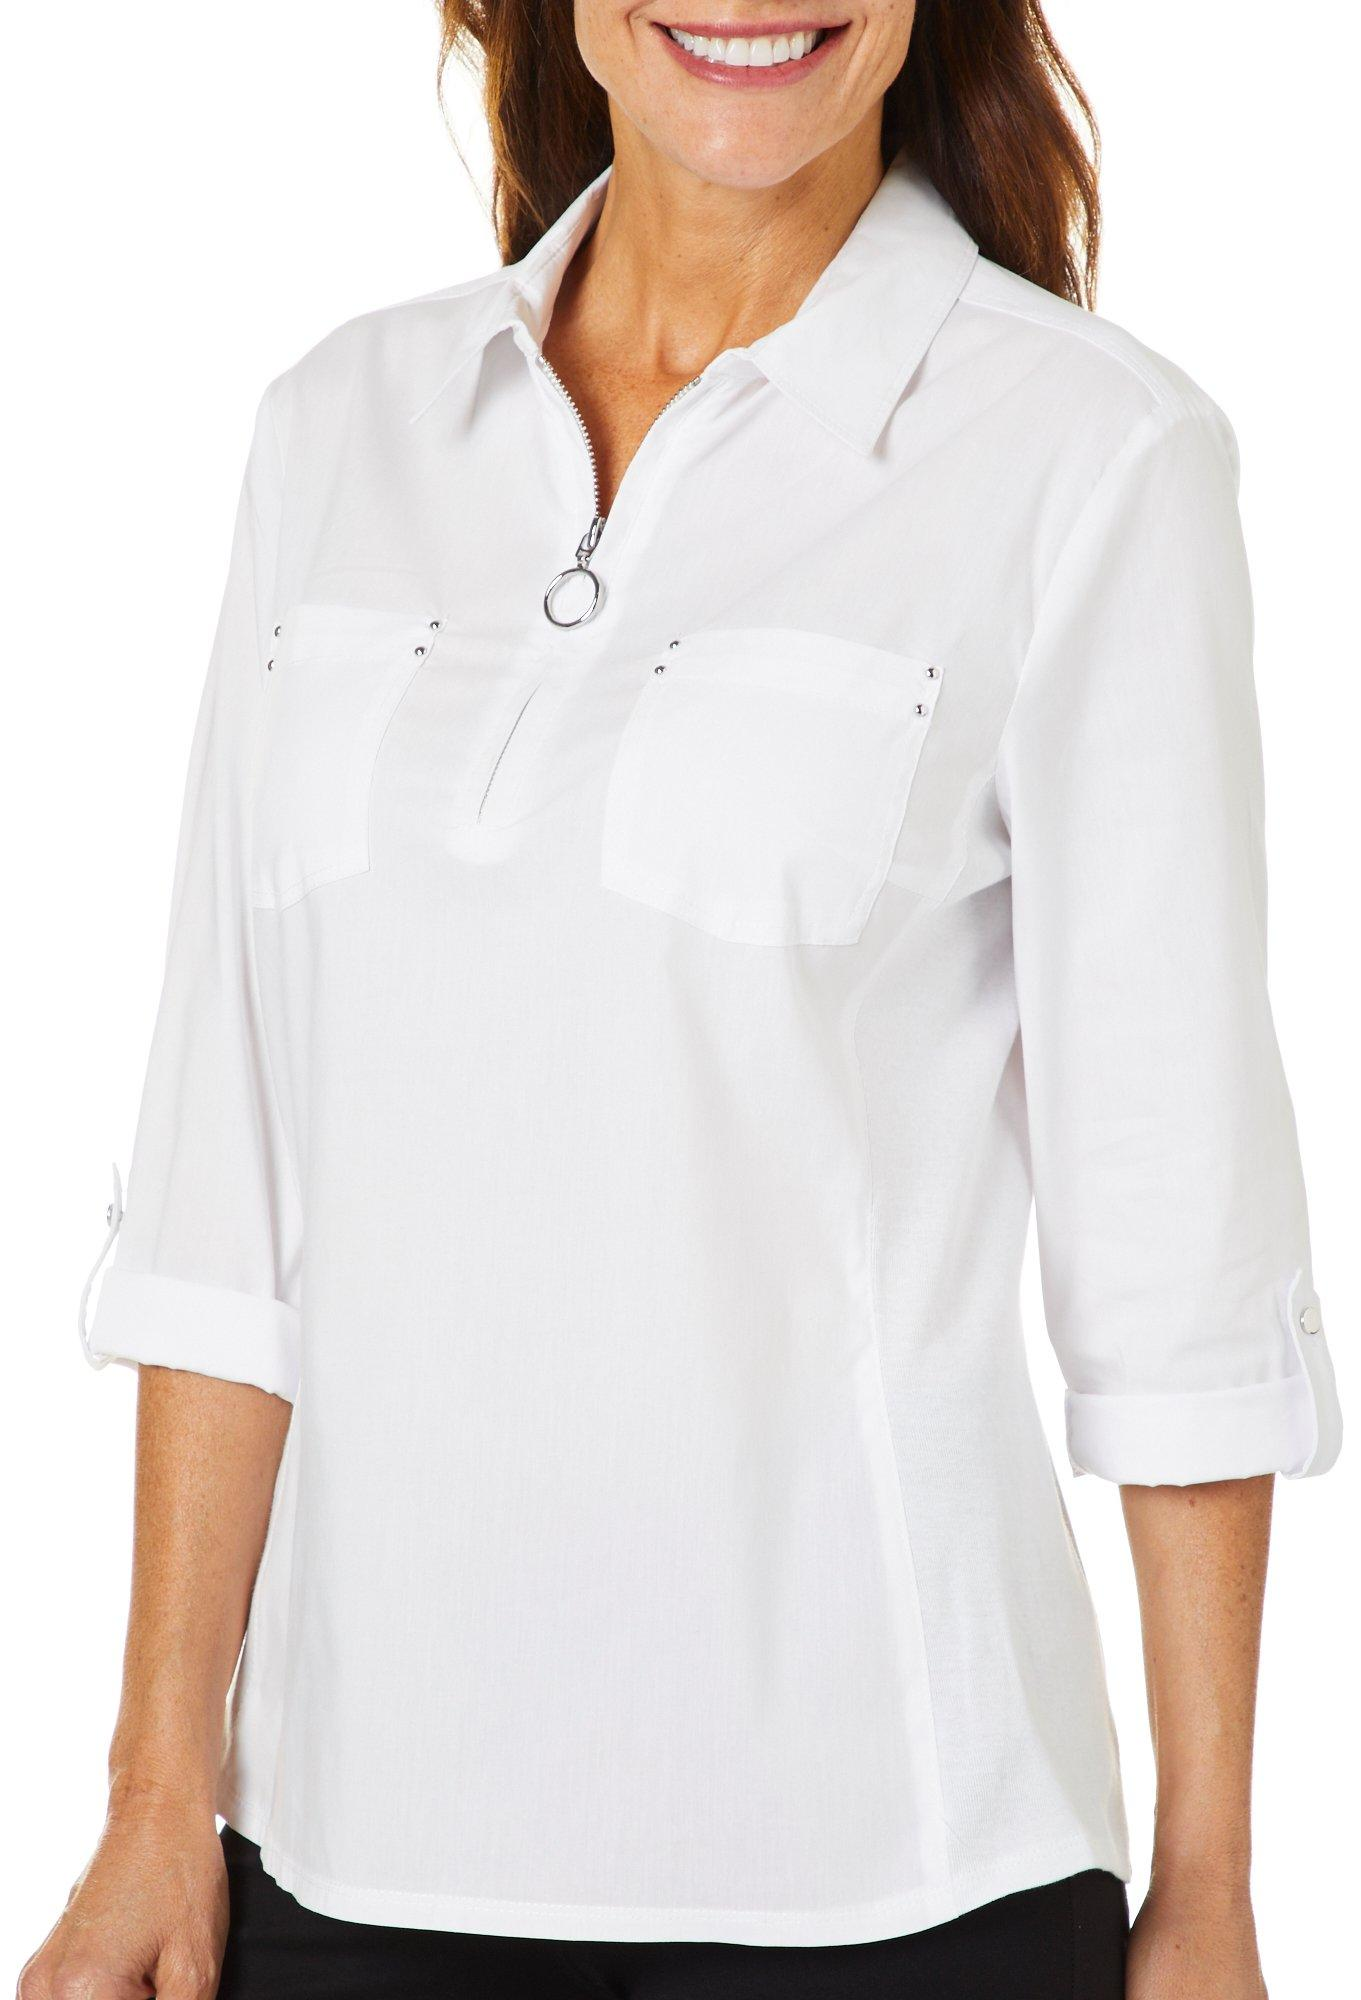 Zac /& Rachel Petite Ultimate Fit Button Front Top WHITE